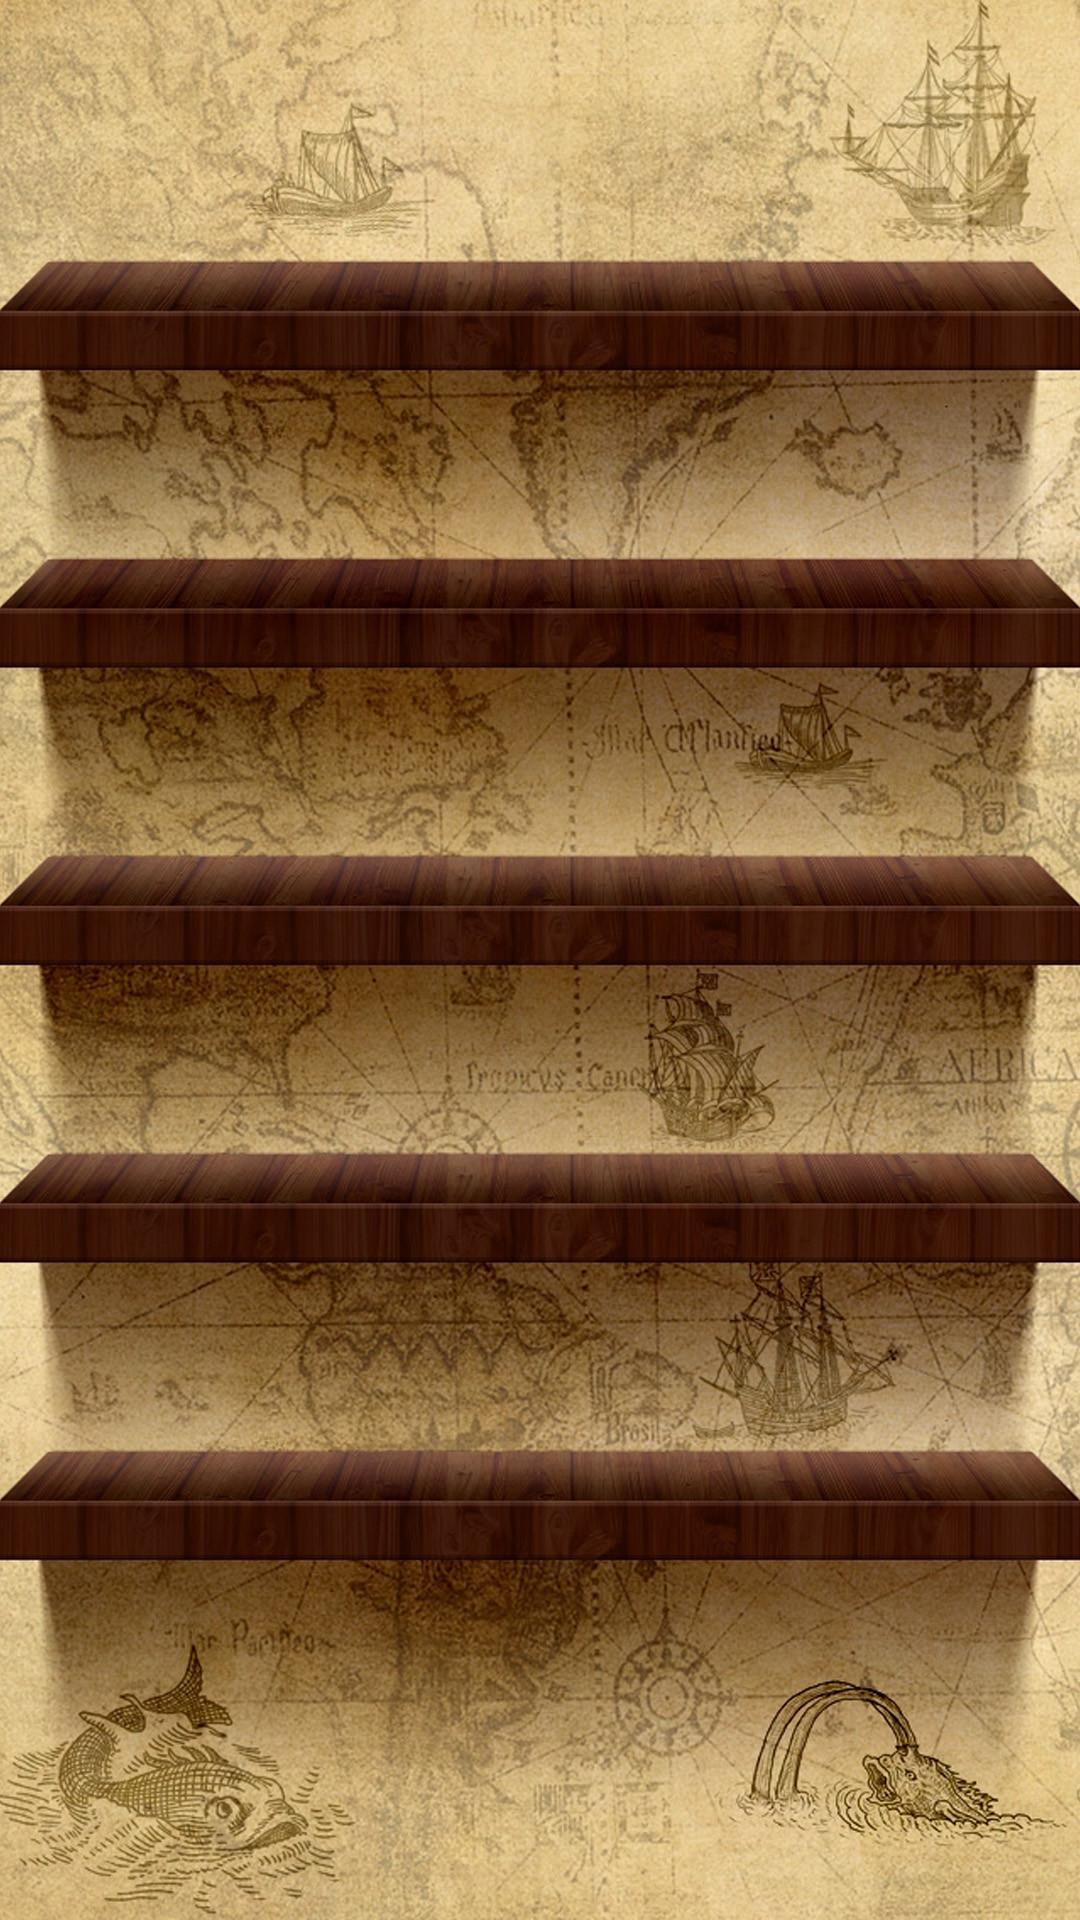 Bookshelf Iphone Wallpaper Desktop Icon Shelf Wallpaper 66 Images